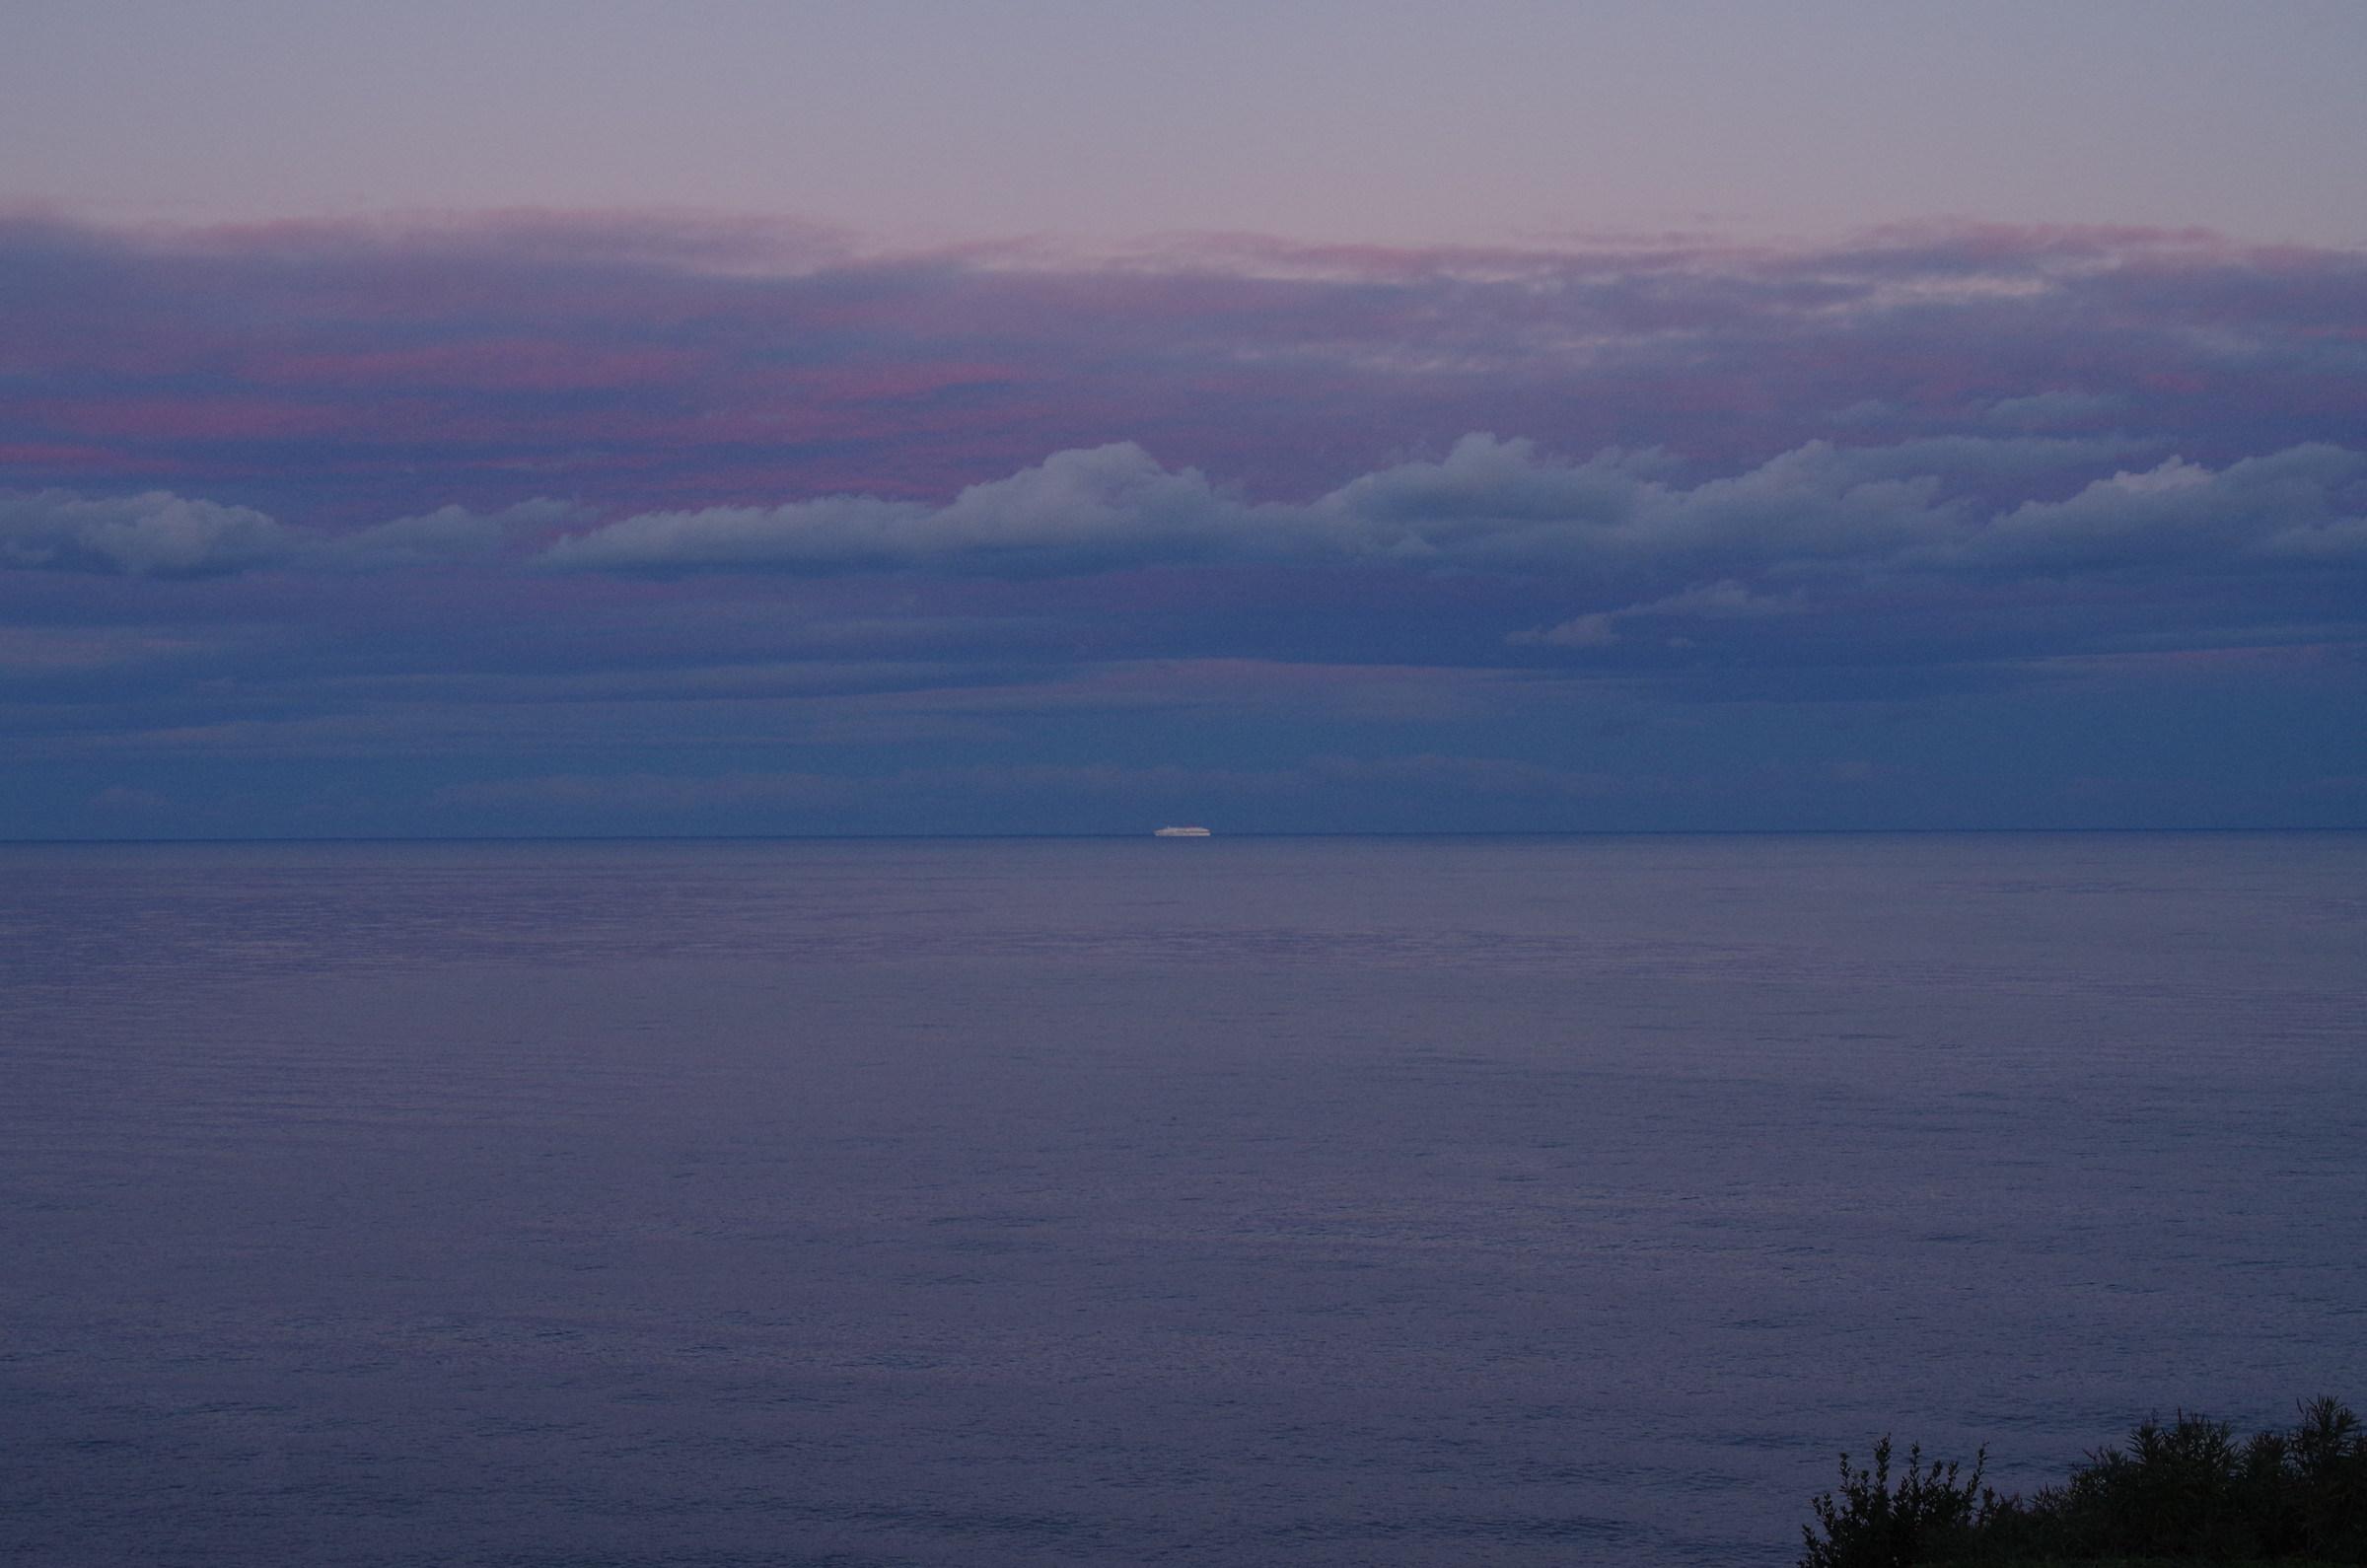 nave all'orizzonte blu...